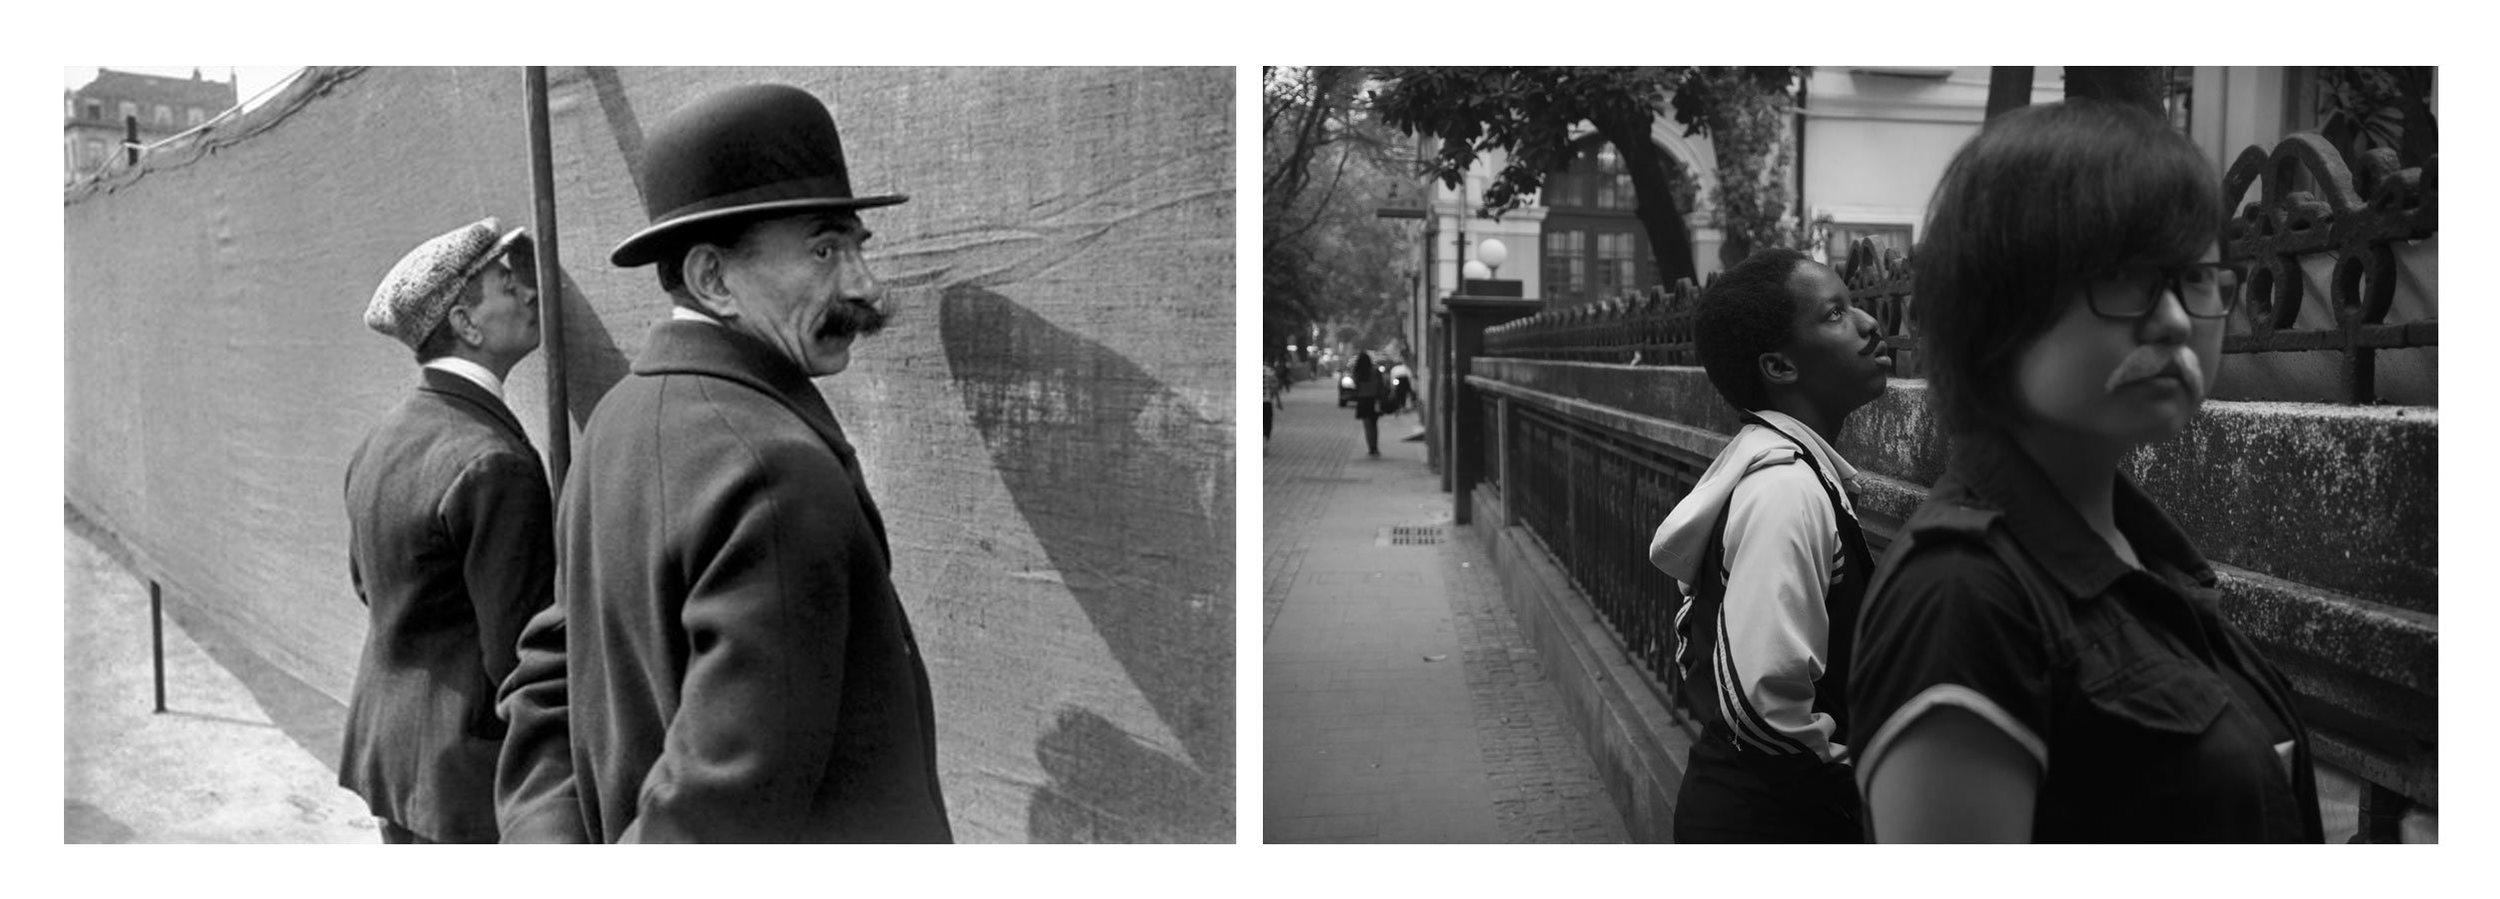 Cartier-Bresson-Homage_4.jpg